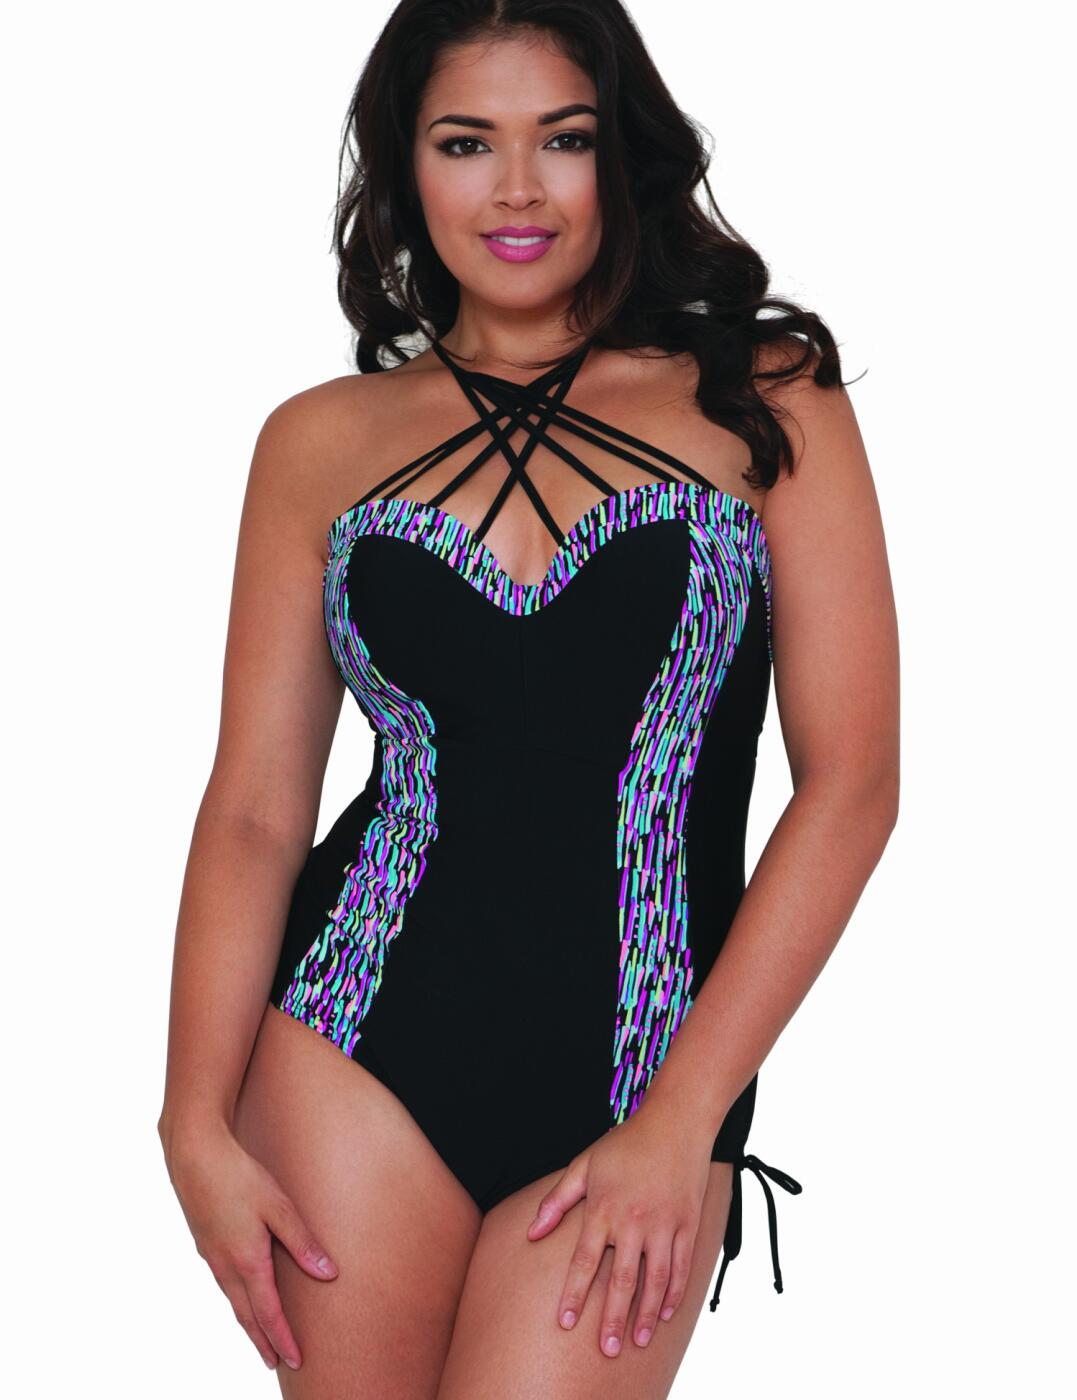 CS3757 Curvy Kate Galaxy Underwired Swimsuit - CS3757 Swimsuit